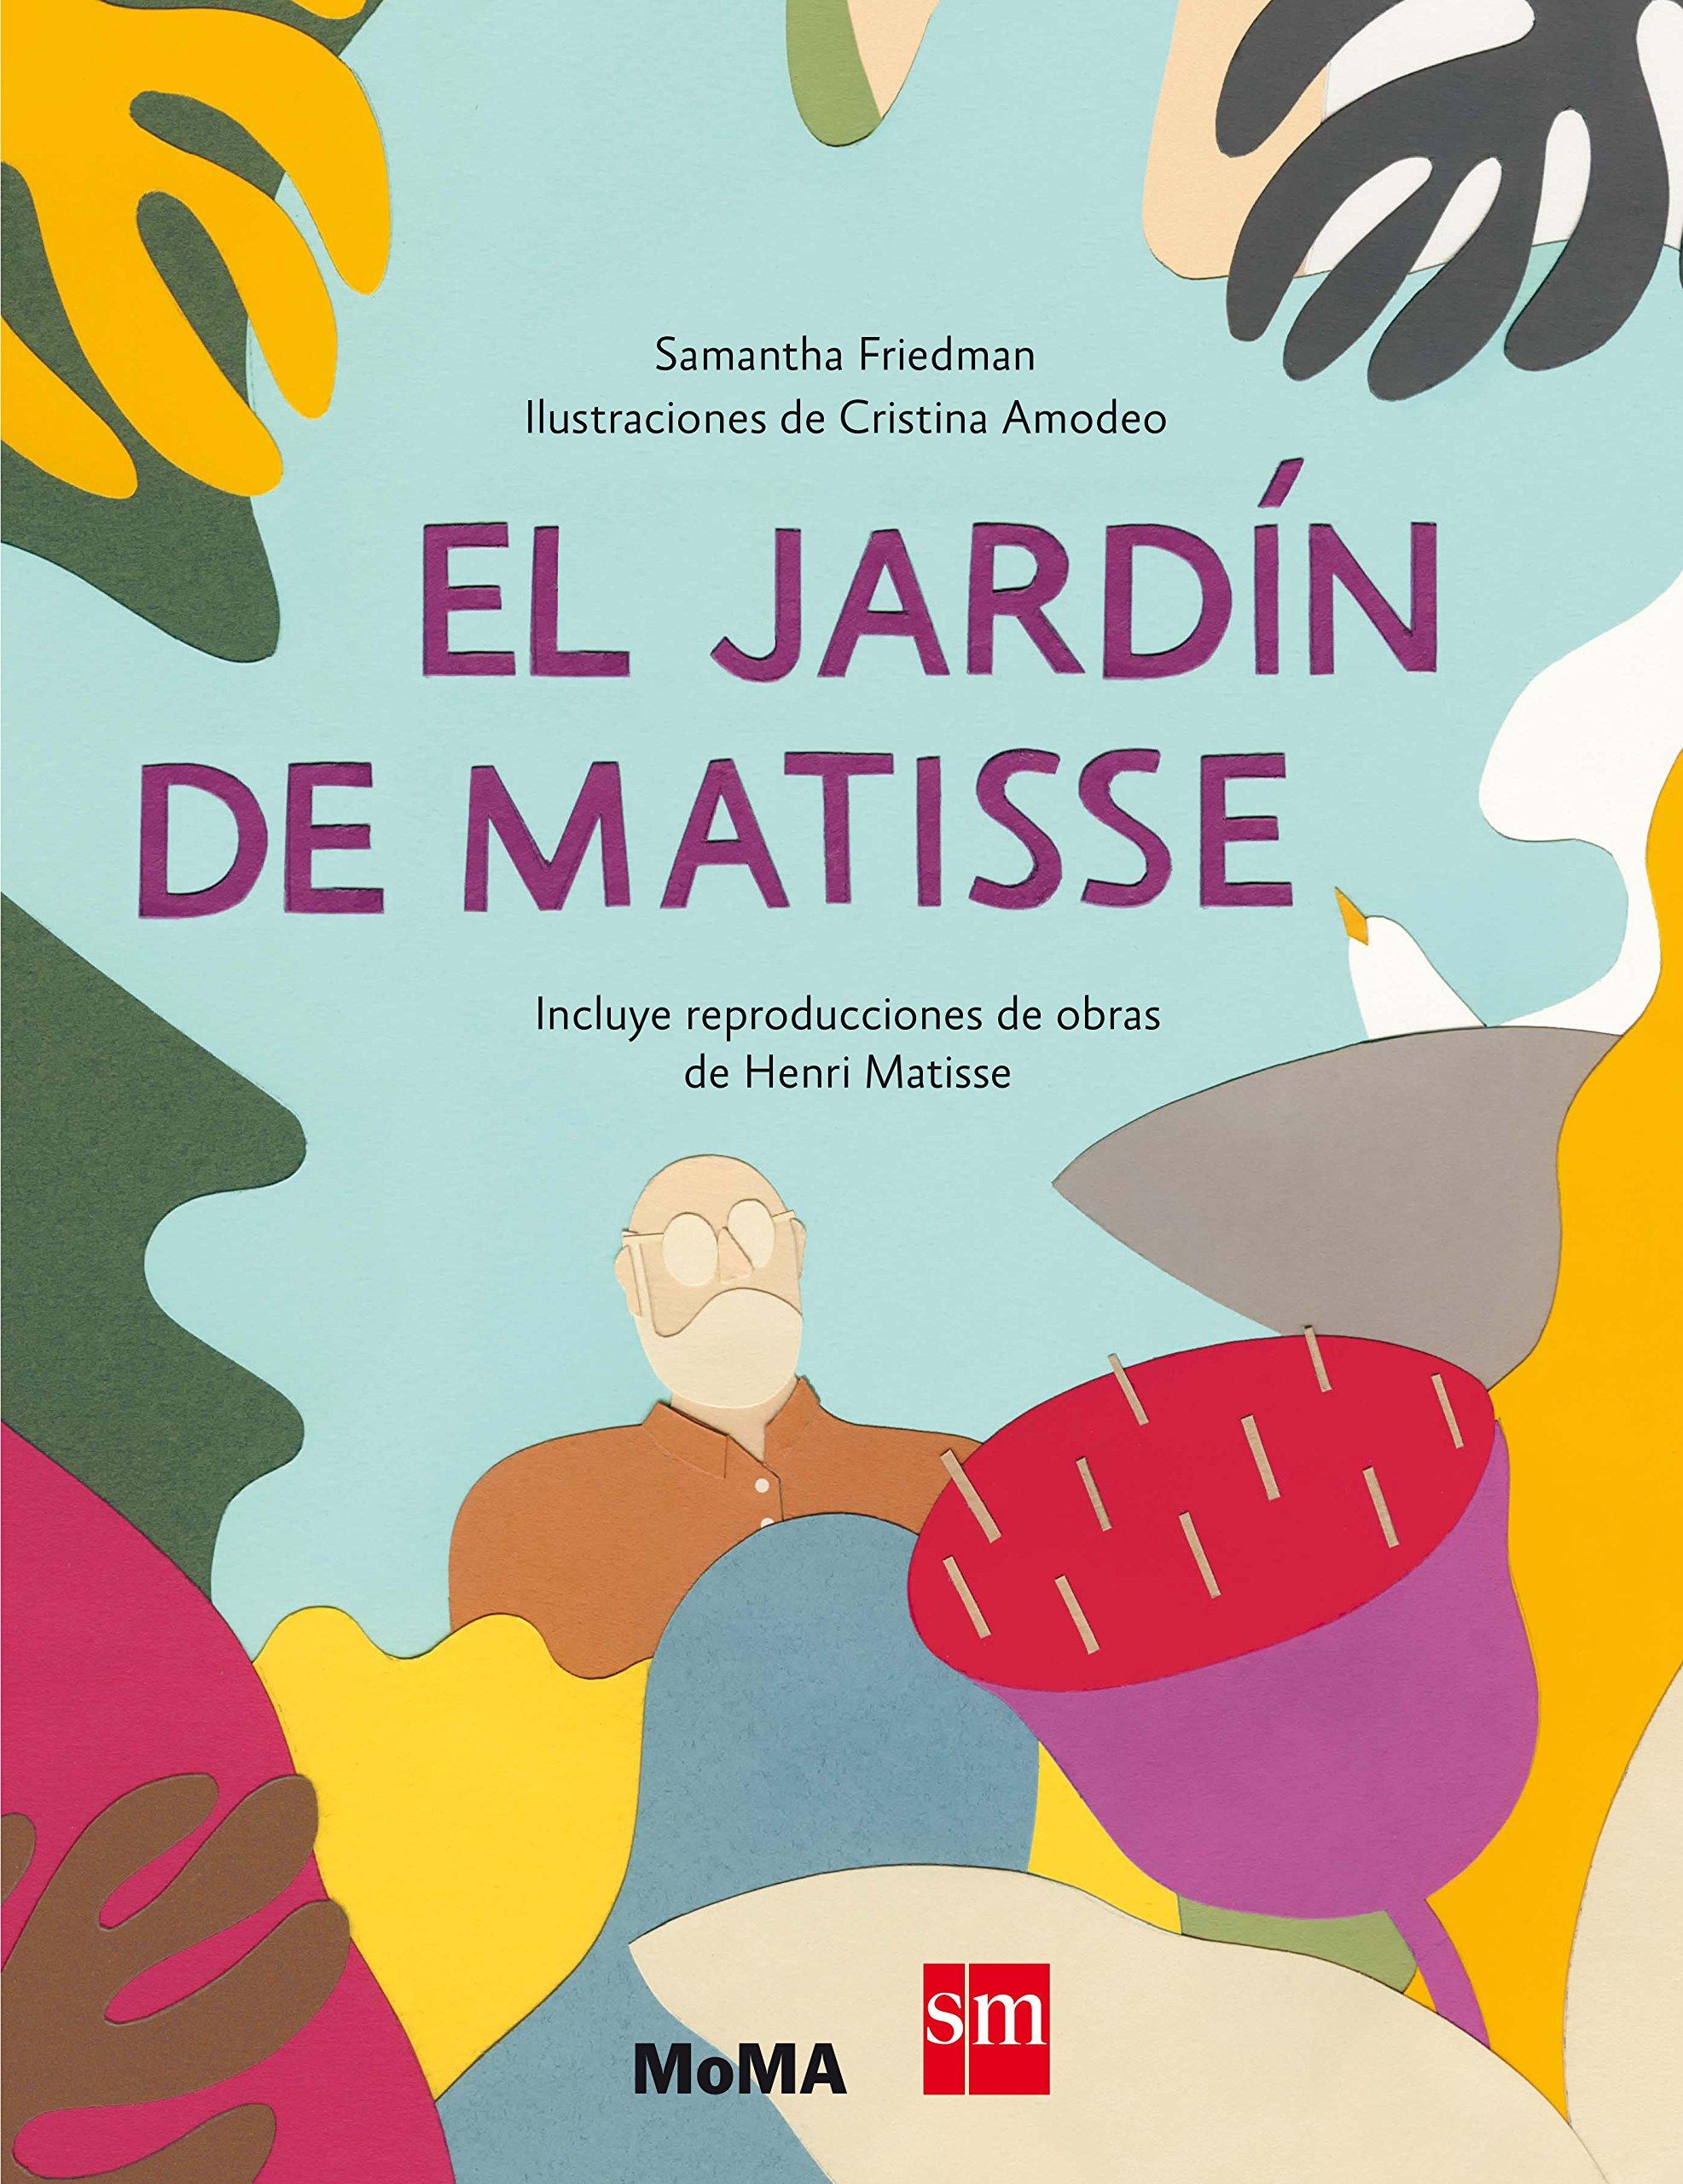 El jardín de Matisse (MOMA): Amazon.es: Friedman, Samantha, Amodeo, Cristina, Tellechea, Teresa: Libros